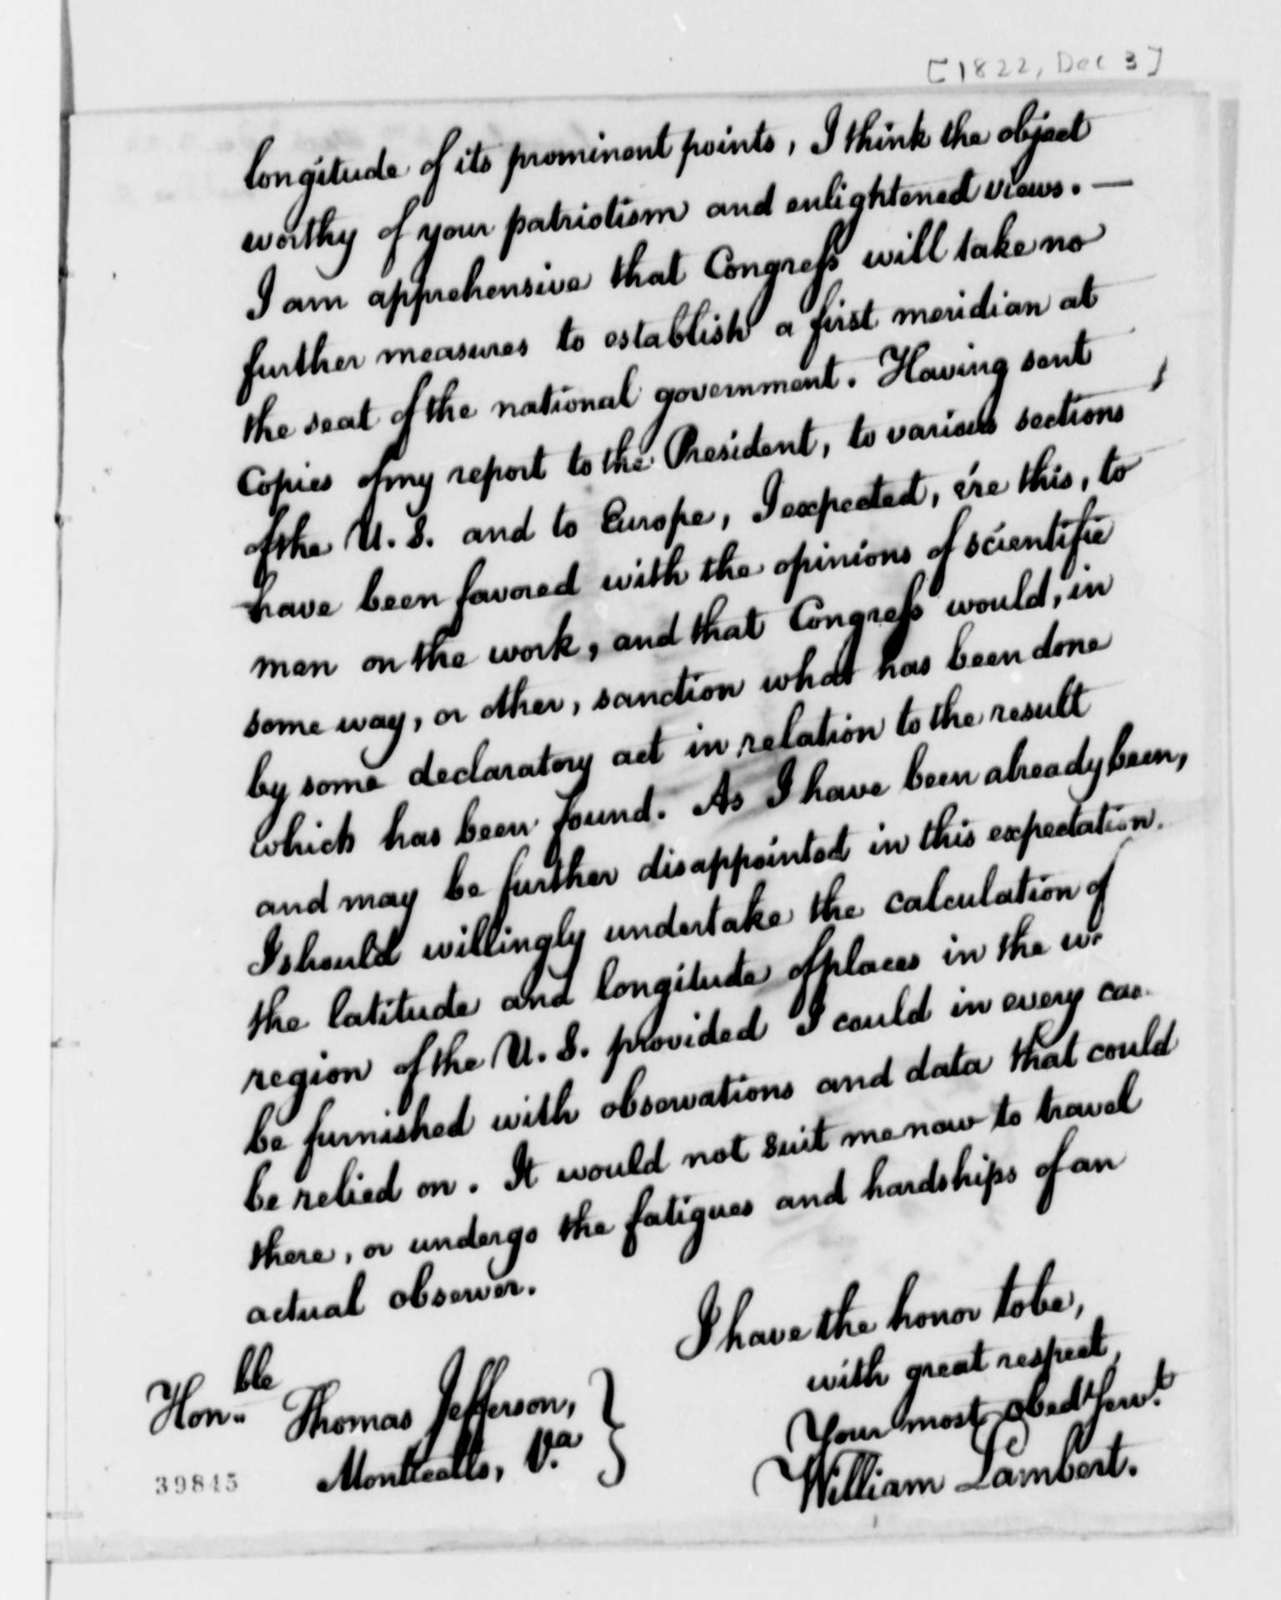 William Lambert to Thomas Jefferson, December 3, 1822